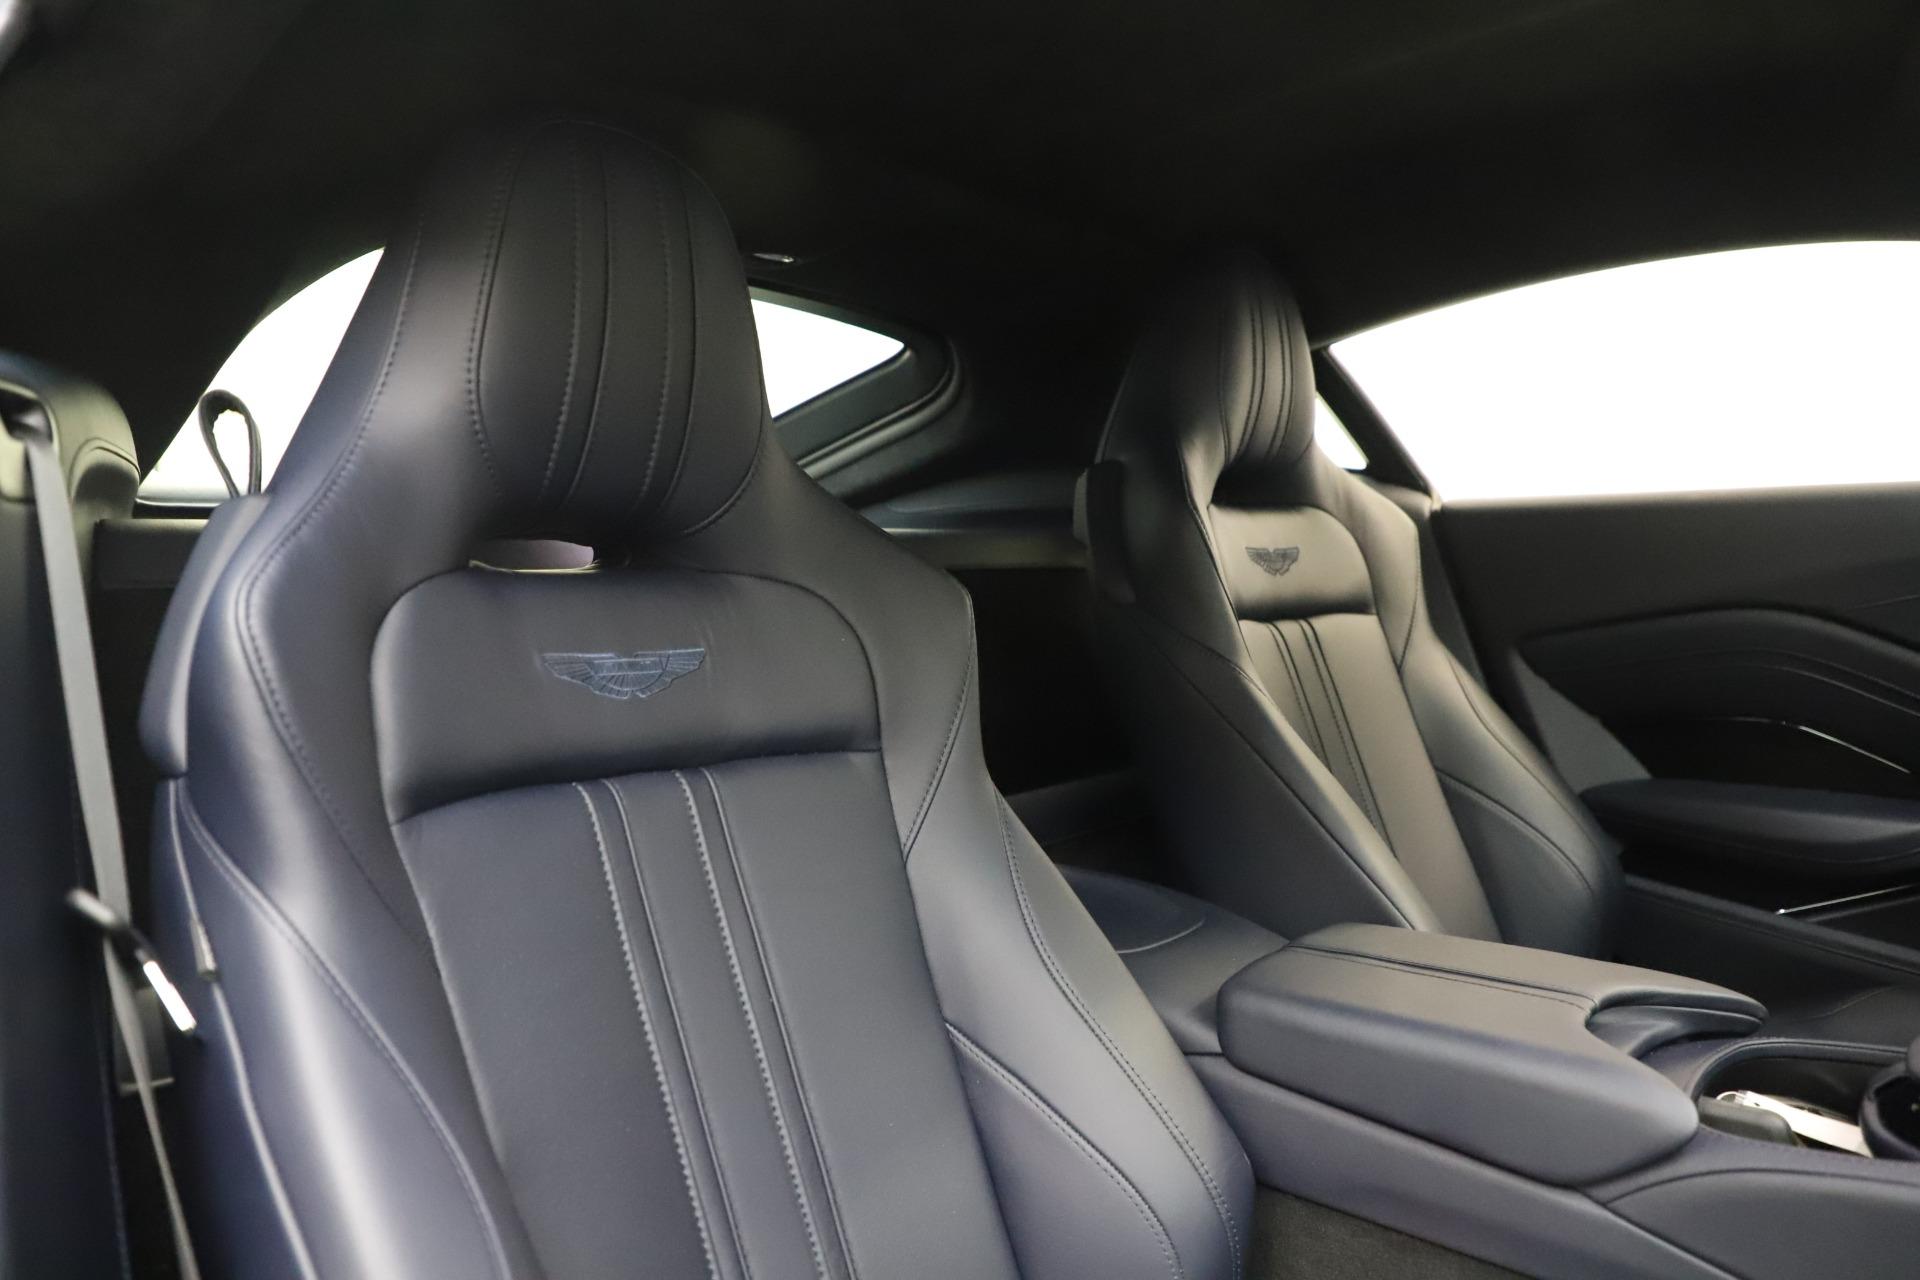 New-2020-Aston-Martin-Vantage-Coupe